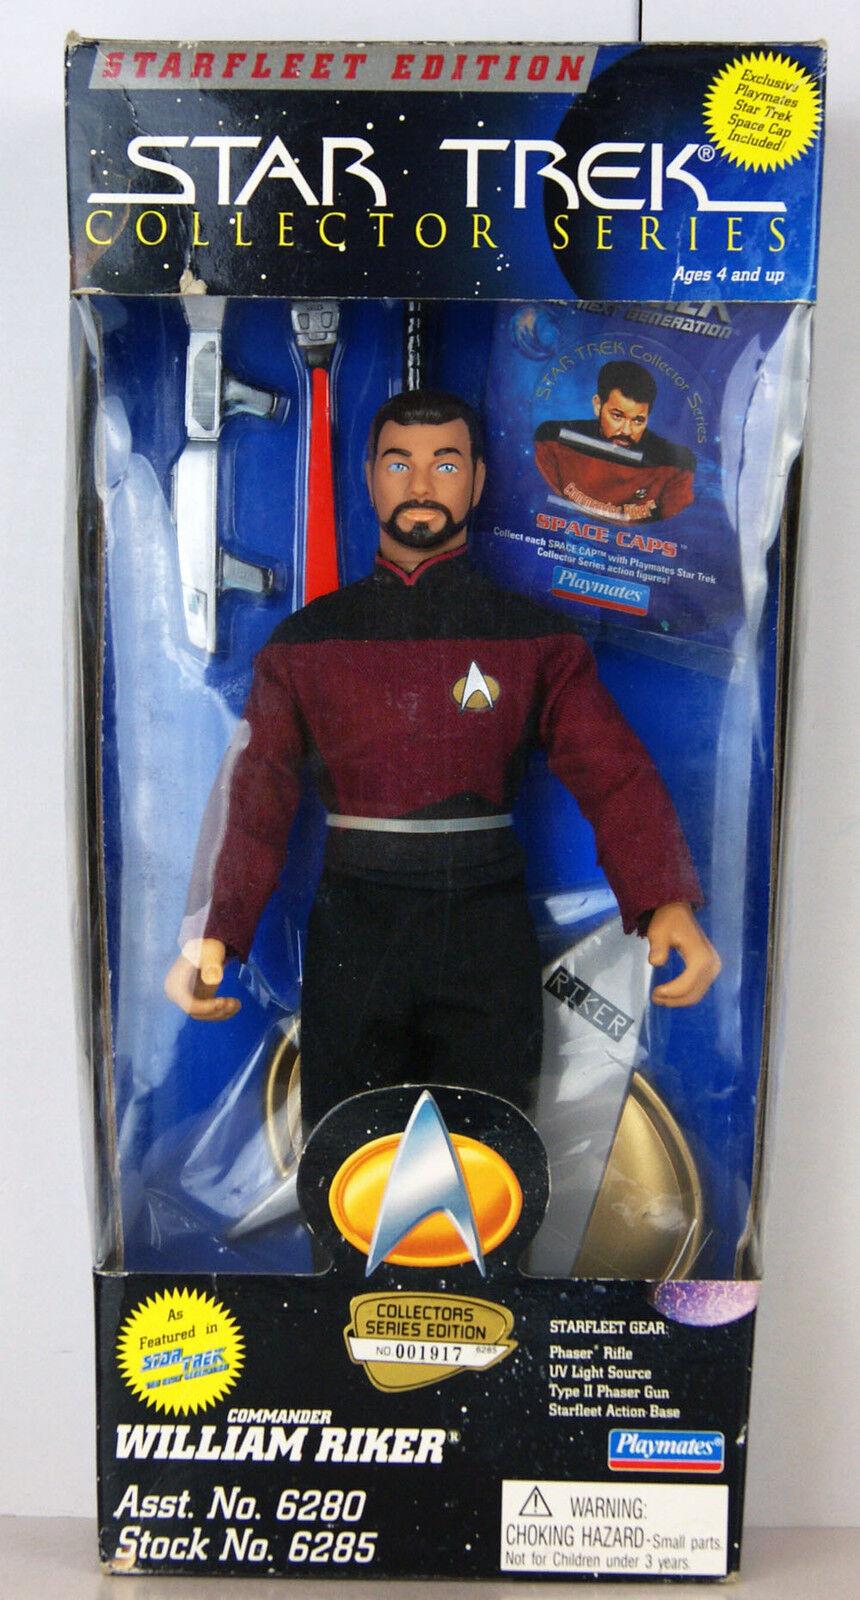 Star Trek - Collector Series - Starfleet Edition - Commander William Riker